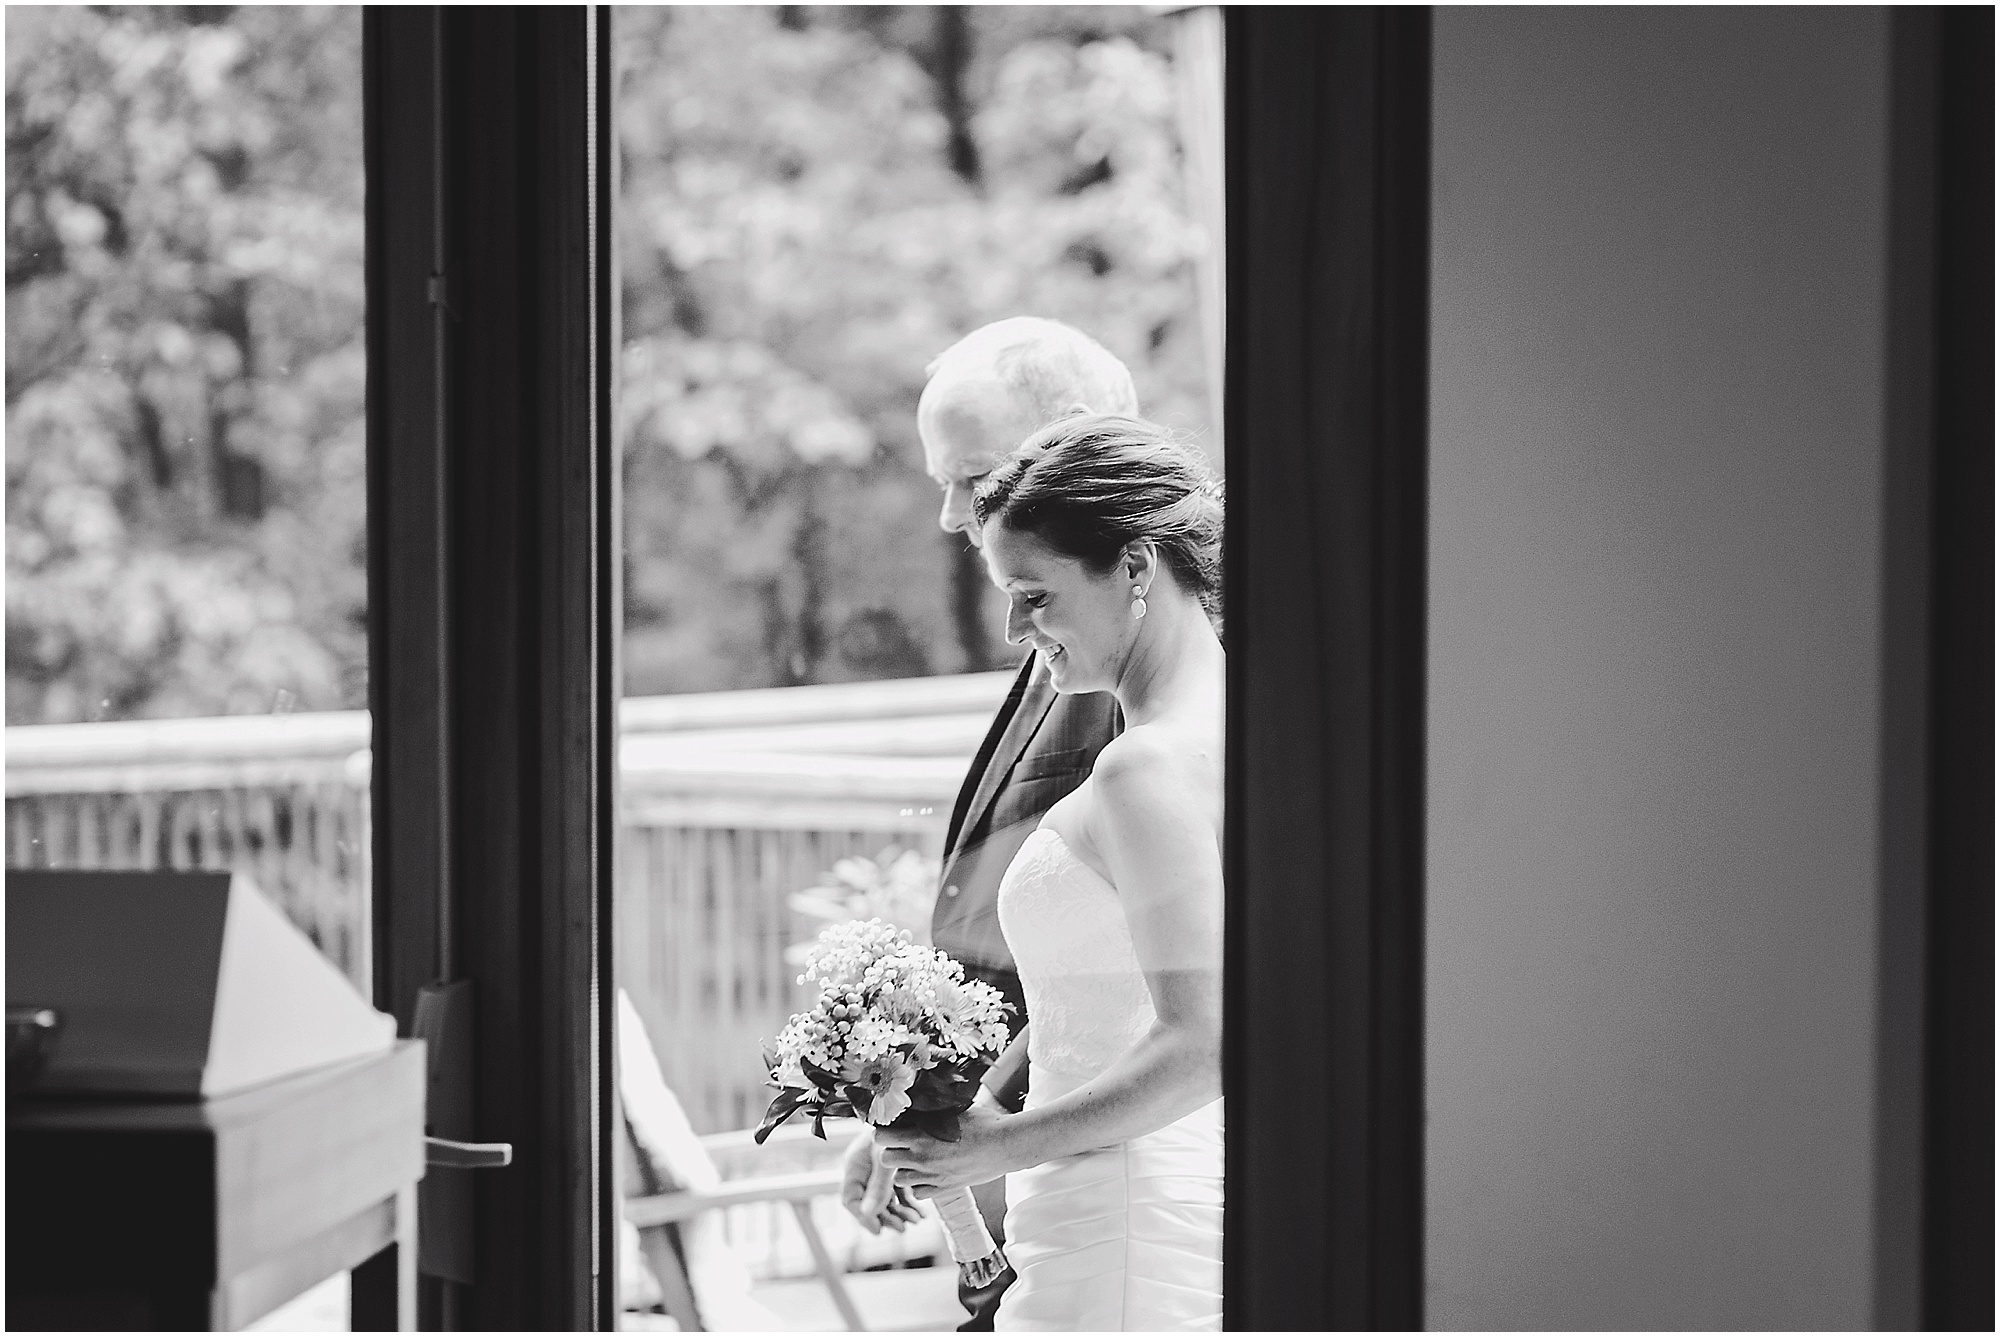 Bruidsreportage Noord-Brabant, Bruidsreportage Eindhoven, bruidsfotograaf Noord-Brabant, bruidsfotograaf Eindhoven, Bruidsfotograaf Heeze, trouwfotograaf Noord-Brabant, trouwfotograaf Eindhoven, Bruidsreportage Heeze, Bruidsreportage Eindhoven, Kaban Heeze